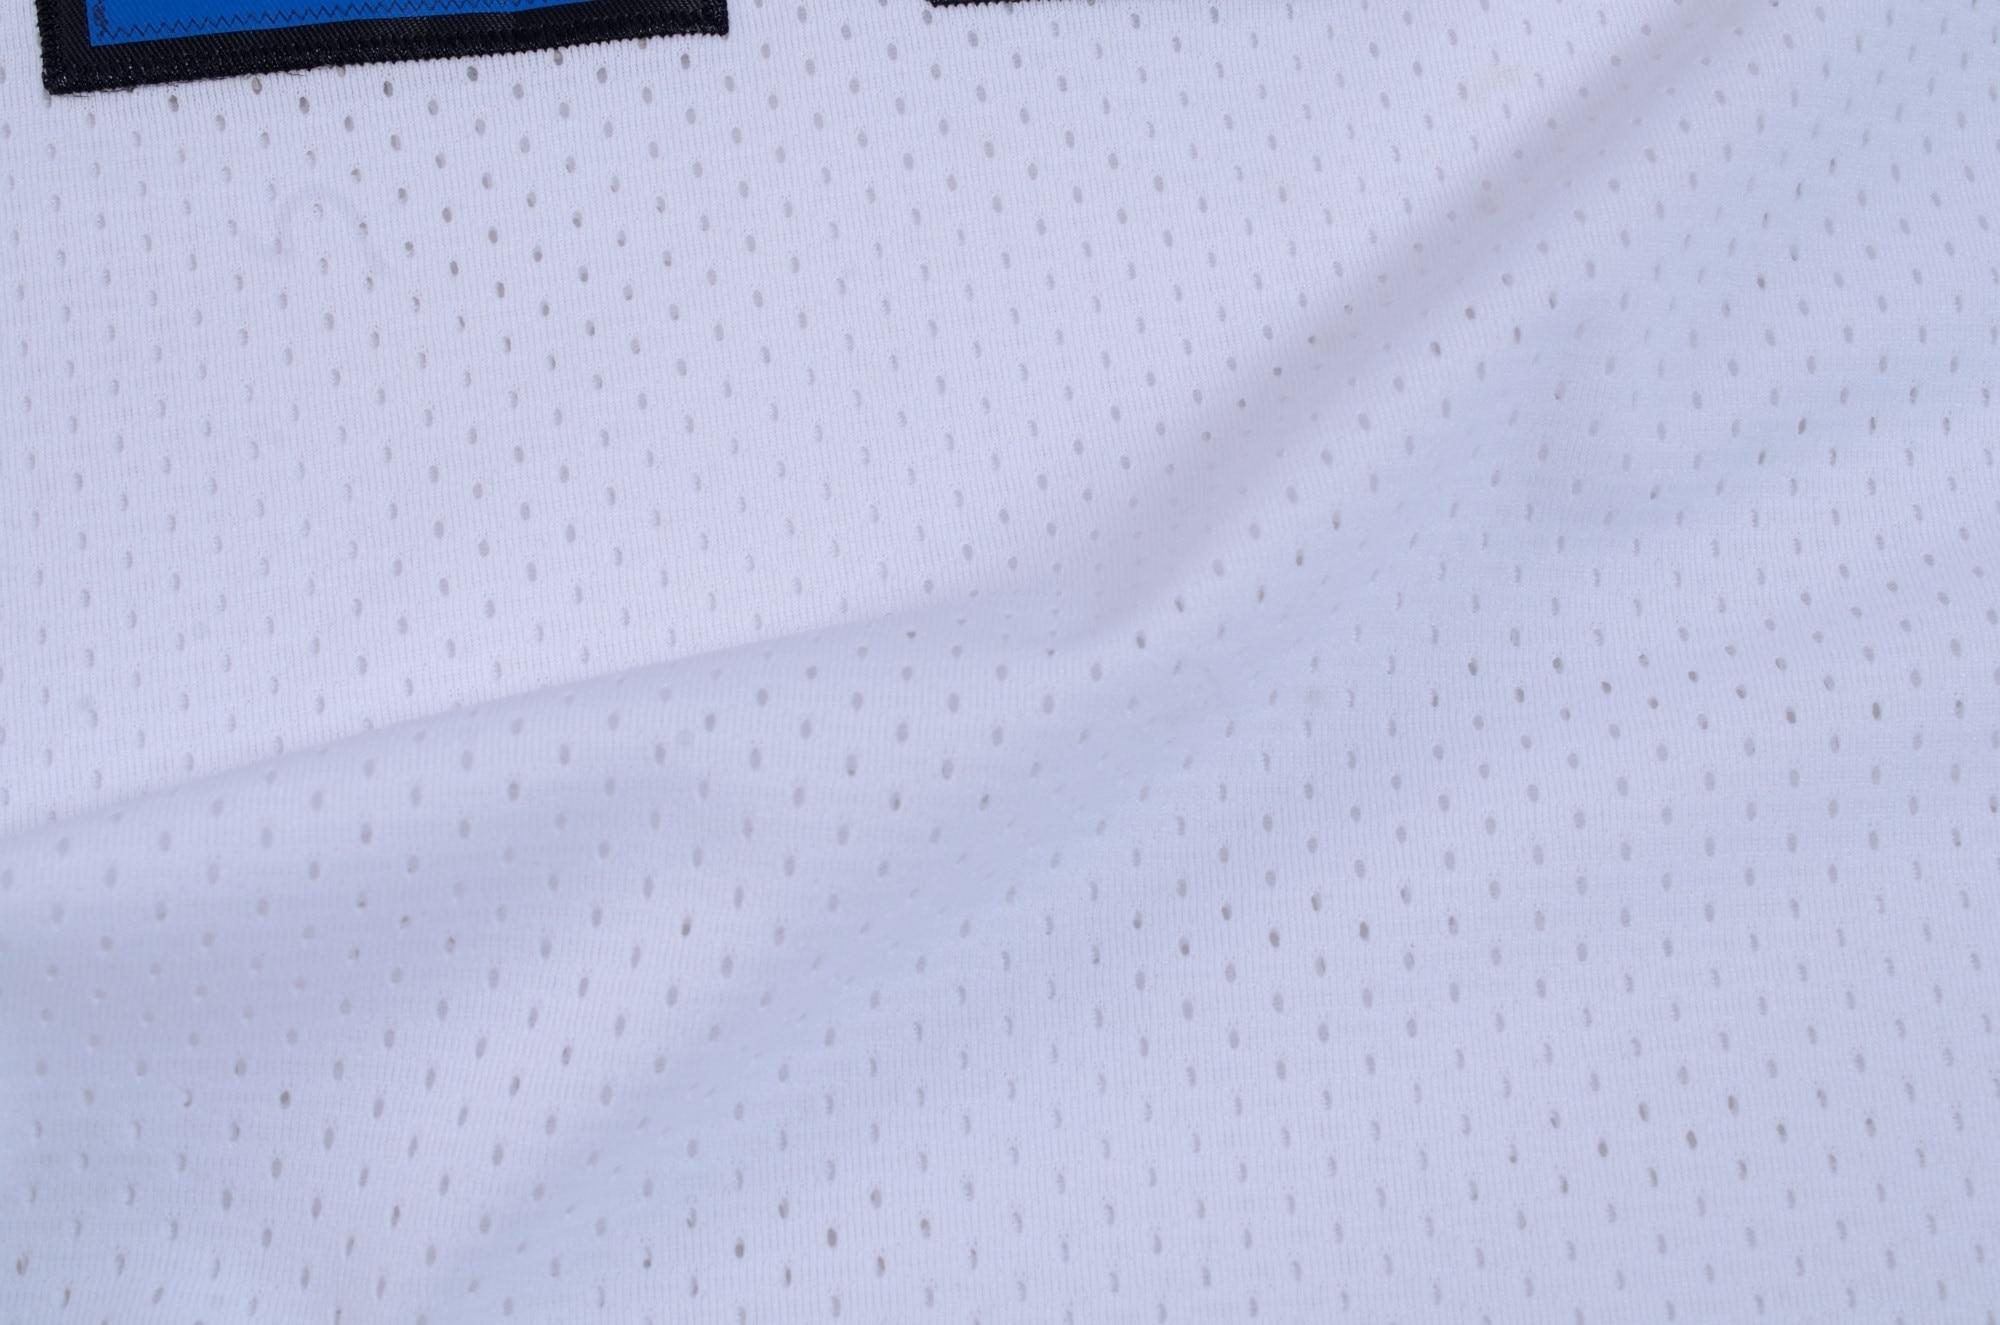 # 3 Camiseta de Baloncesto Lucas Scott Tree Hill Ravens Jersey de pel/ícula Deportiva Jersey de Malla Cosida Top Algod/ón Negro Blanco Azul